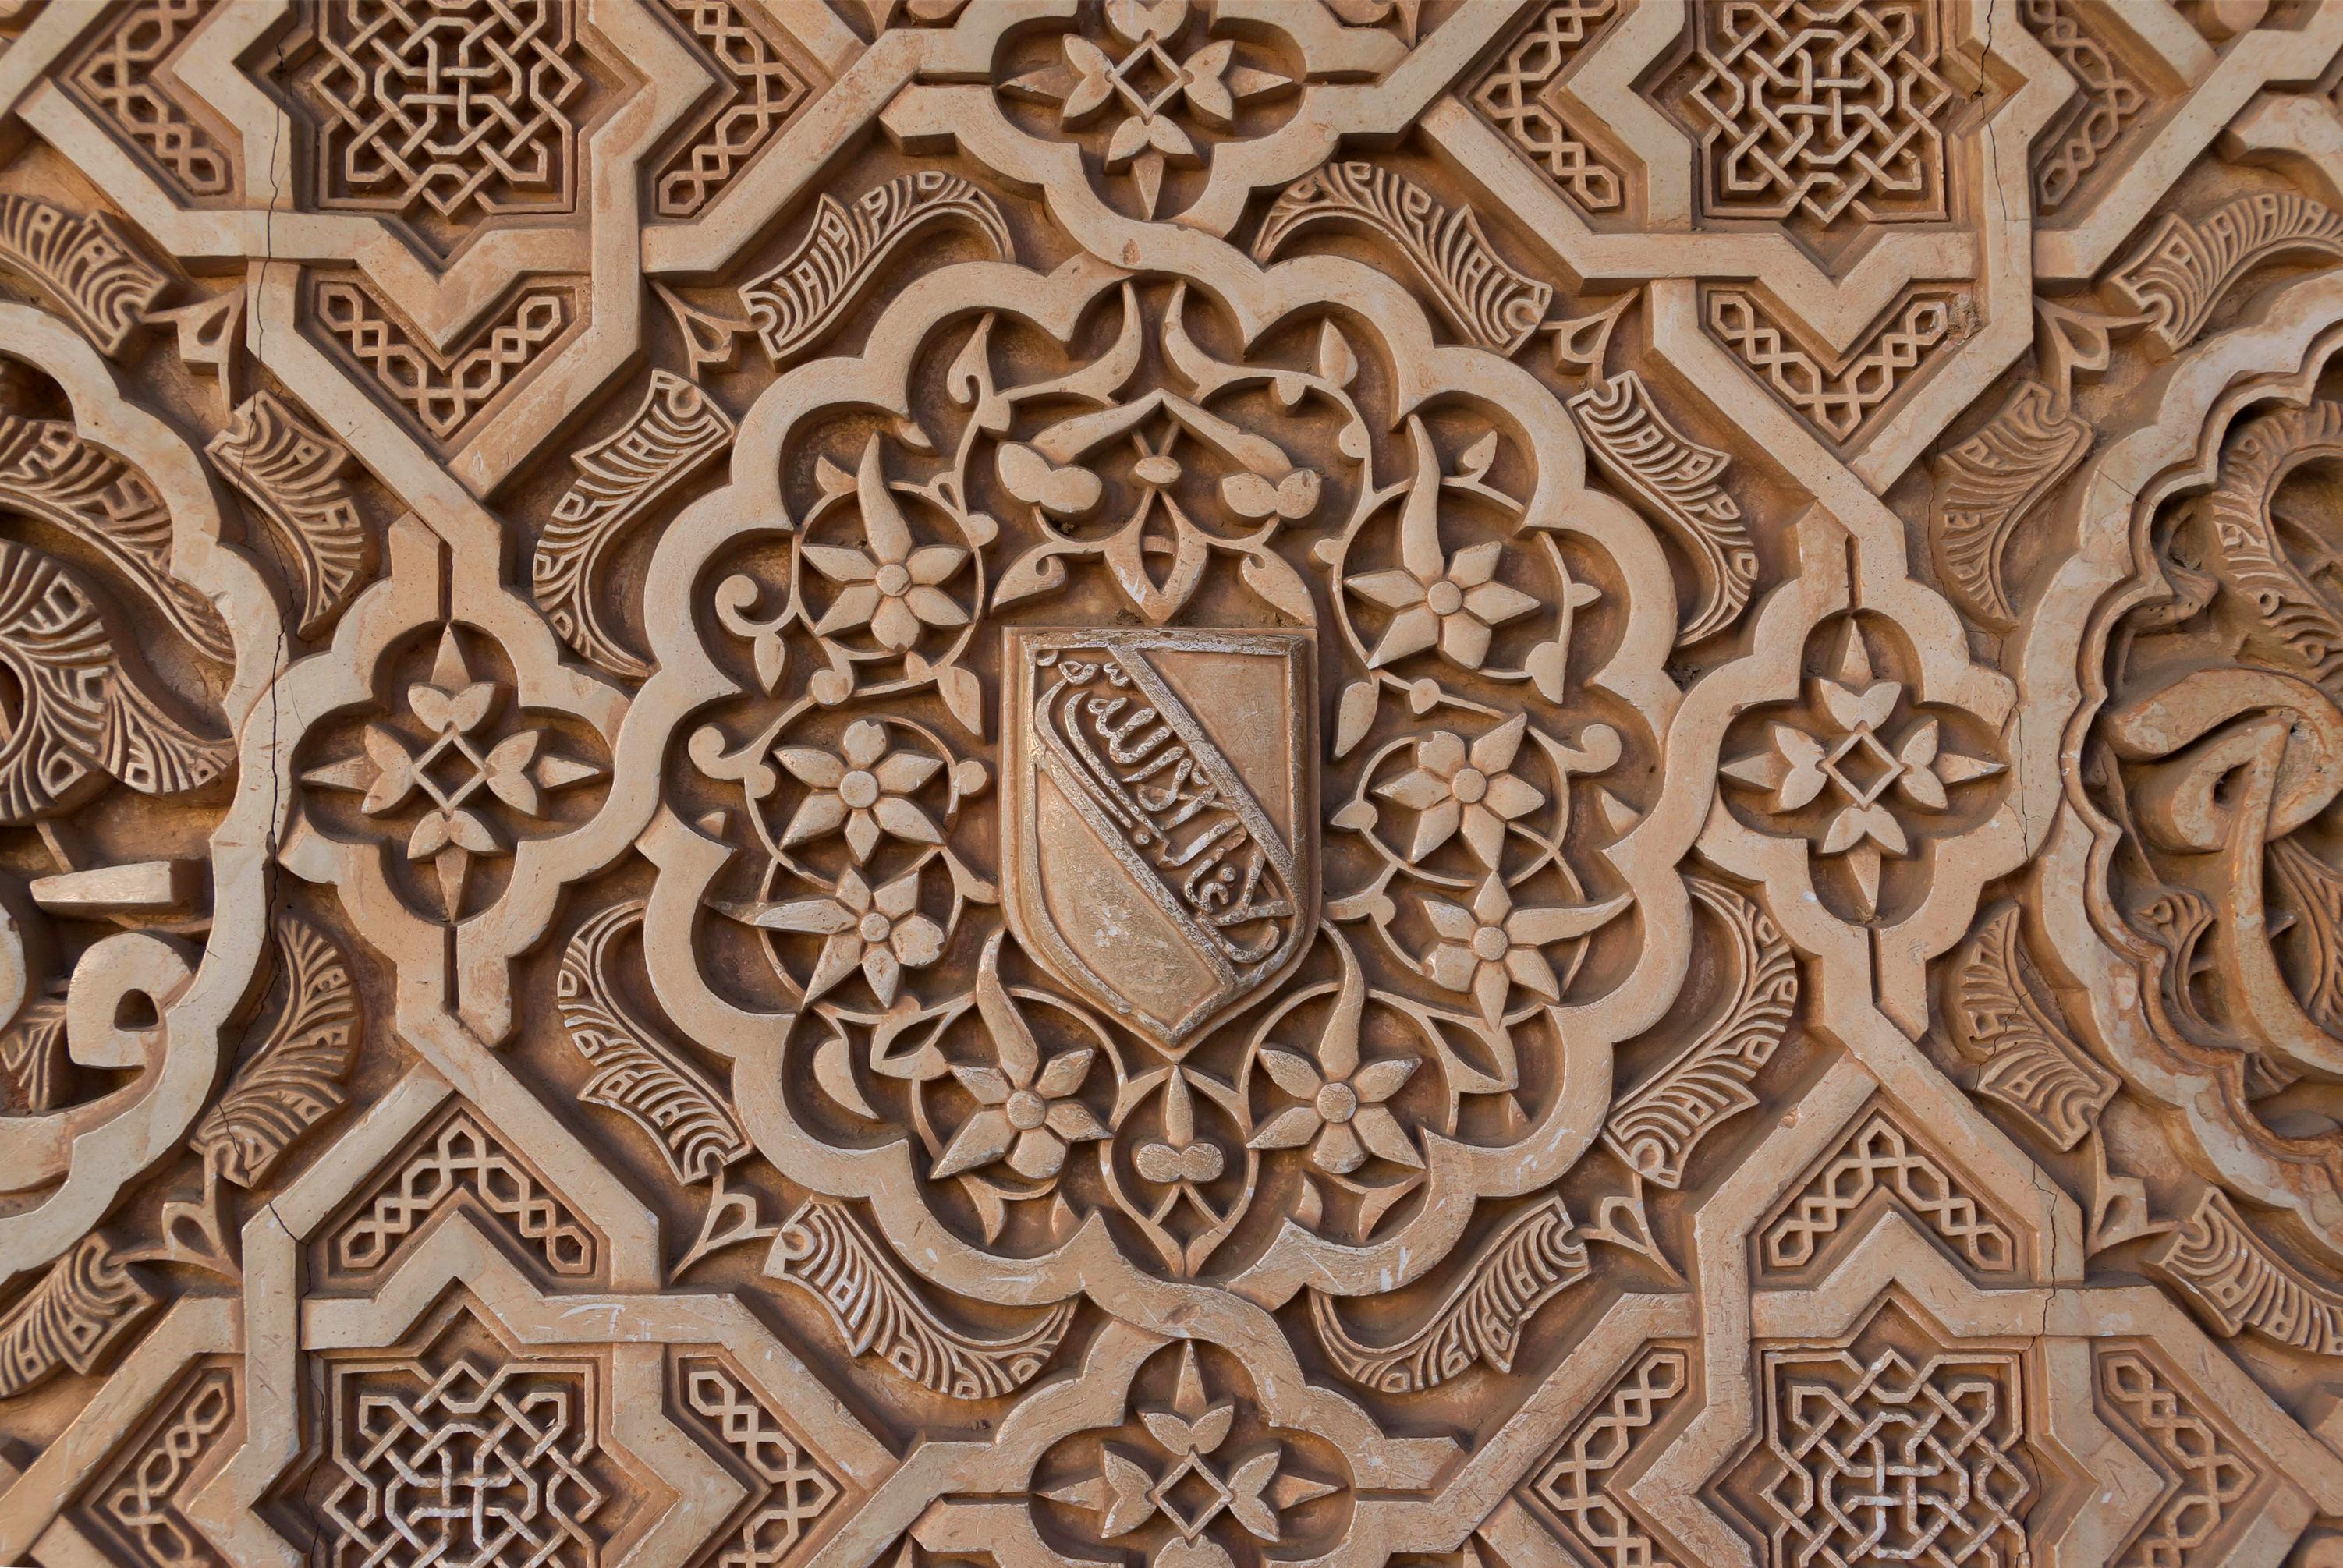 FileCoA Nasrid Kings Alhambra Granada Spainjpg